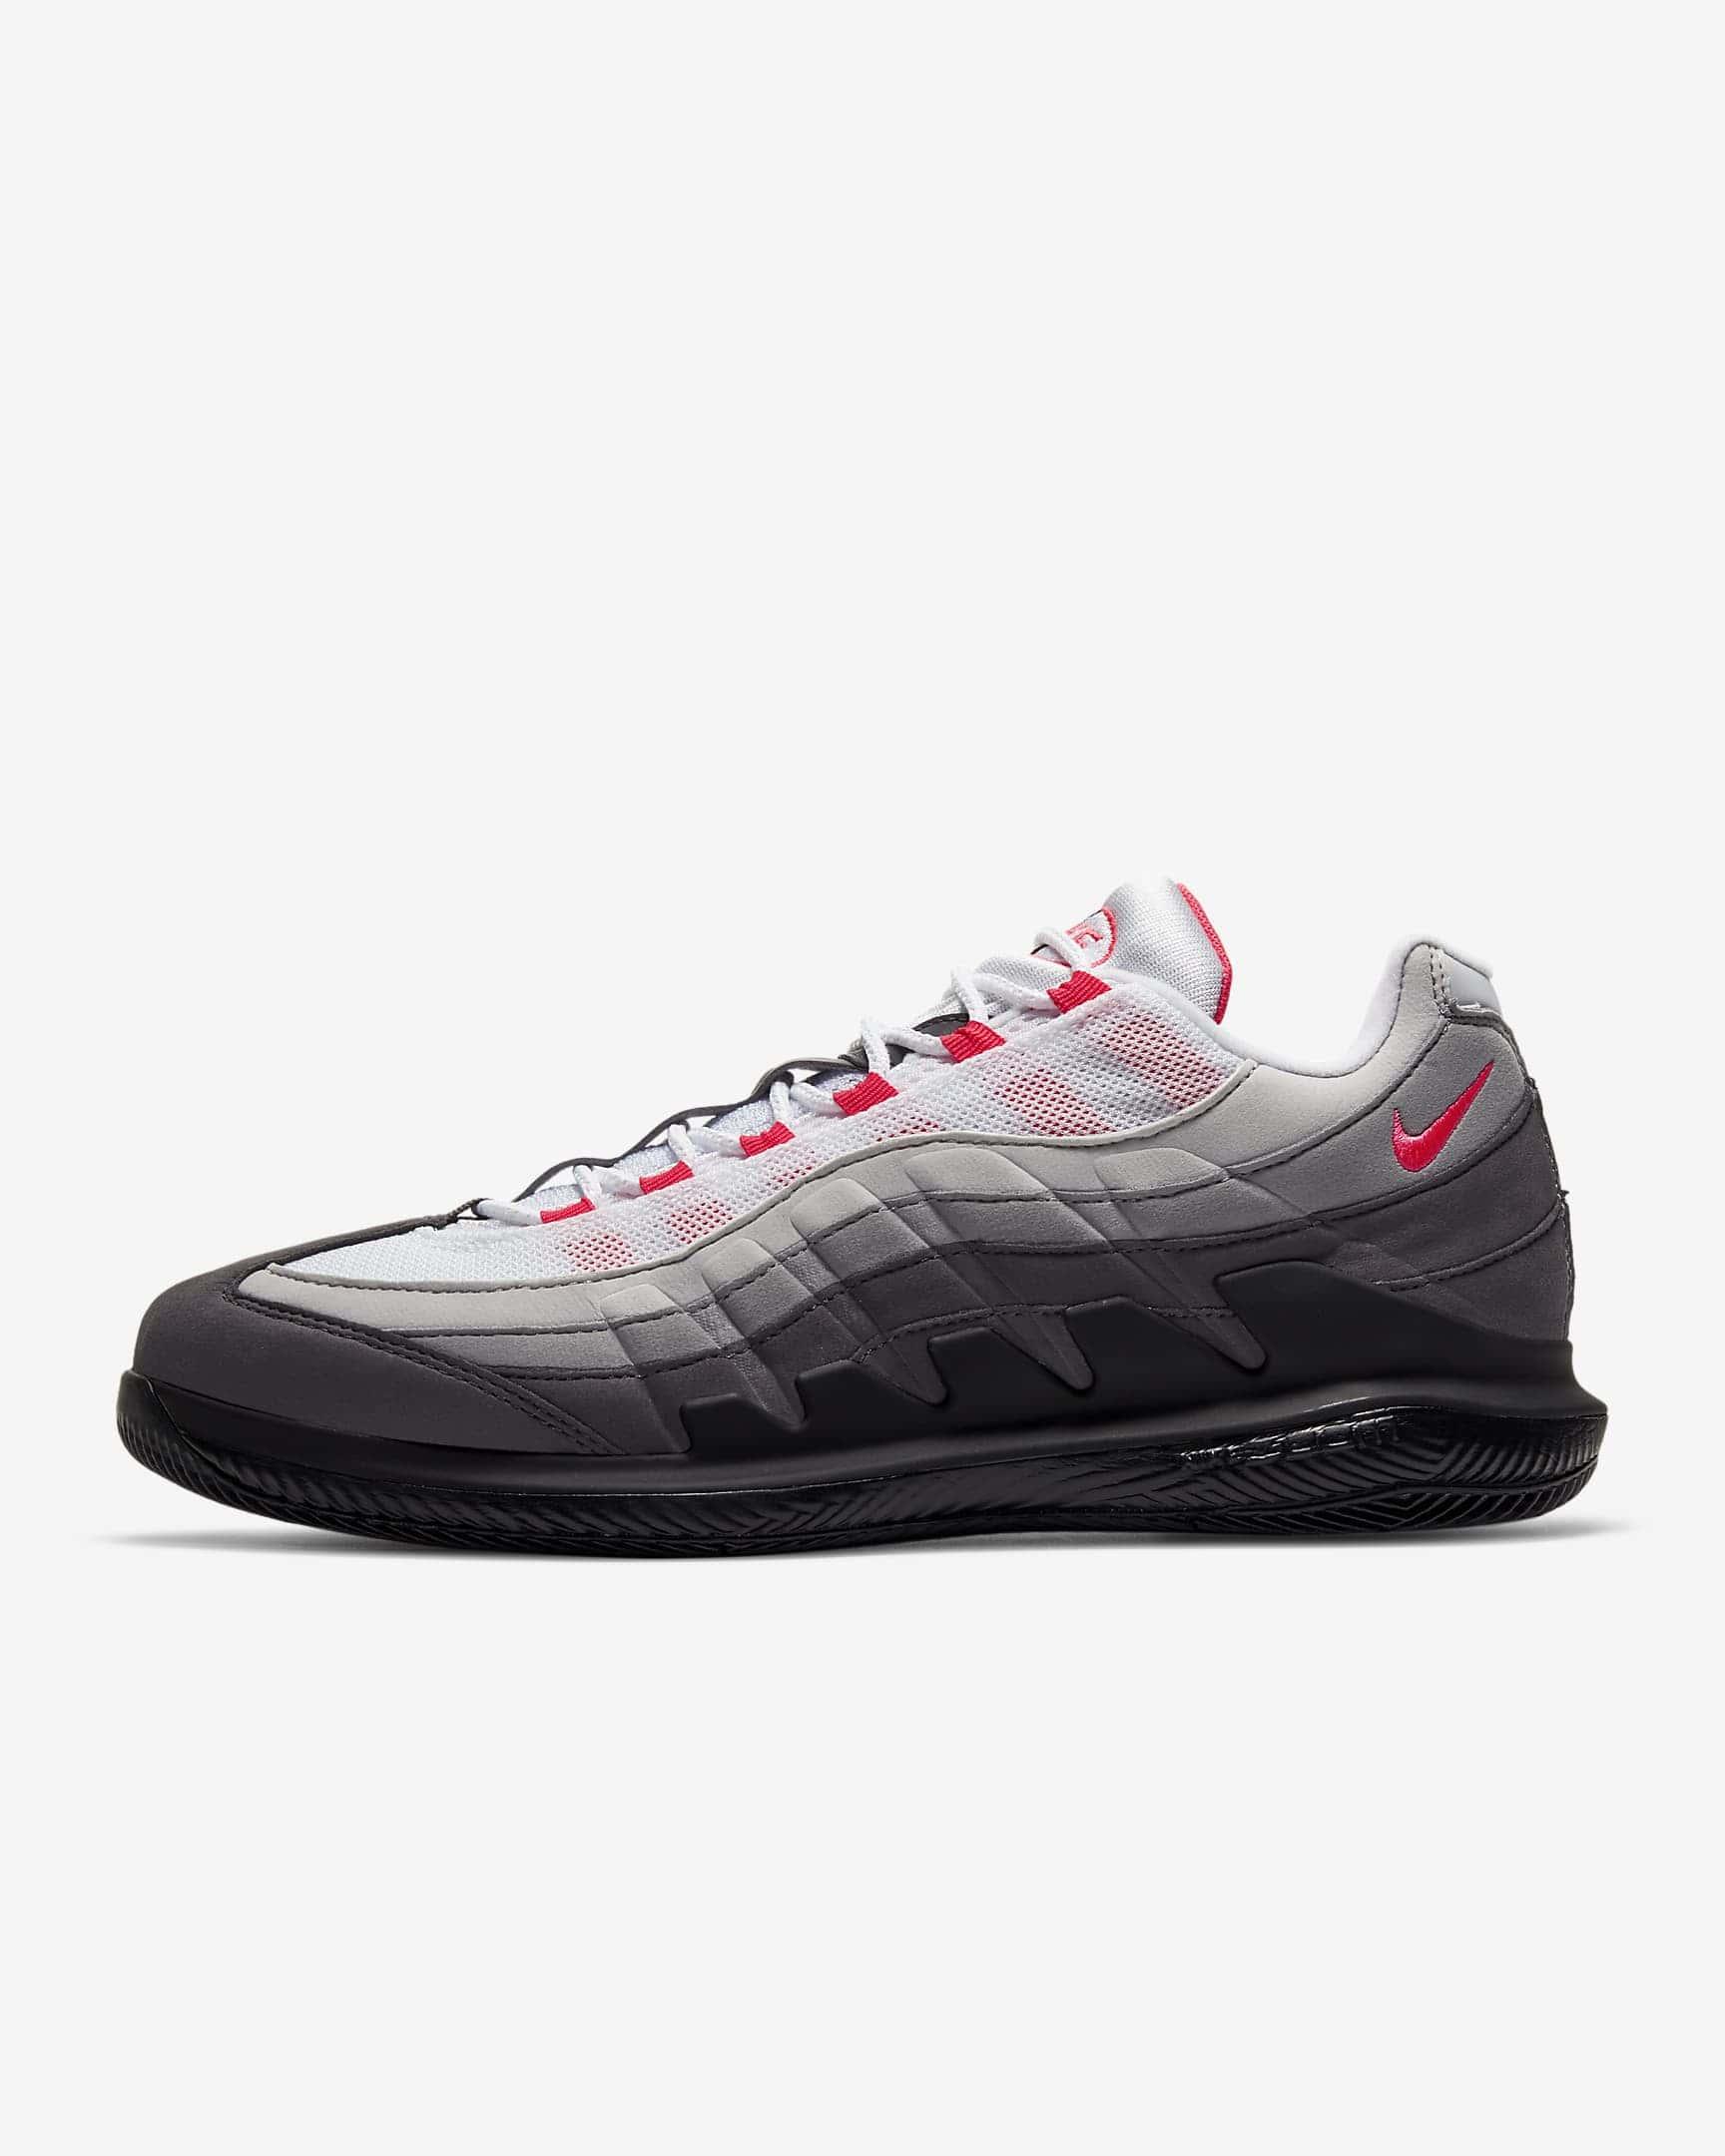 Nike Air Zoom Vapor X Air Max 95 In-depth Review | Tennisshoeslab